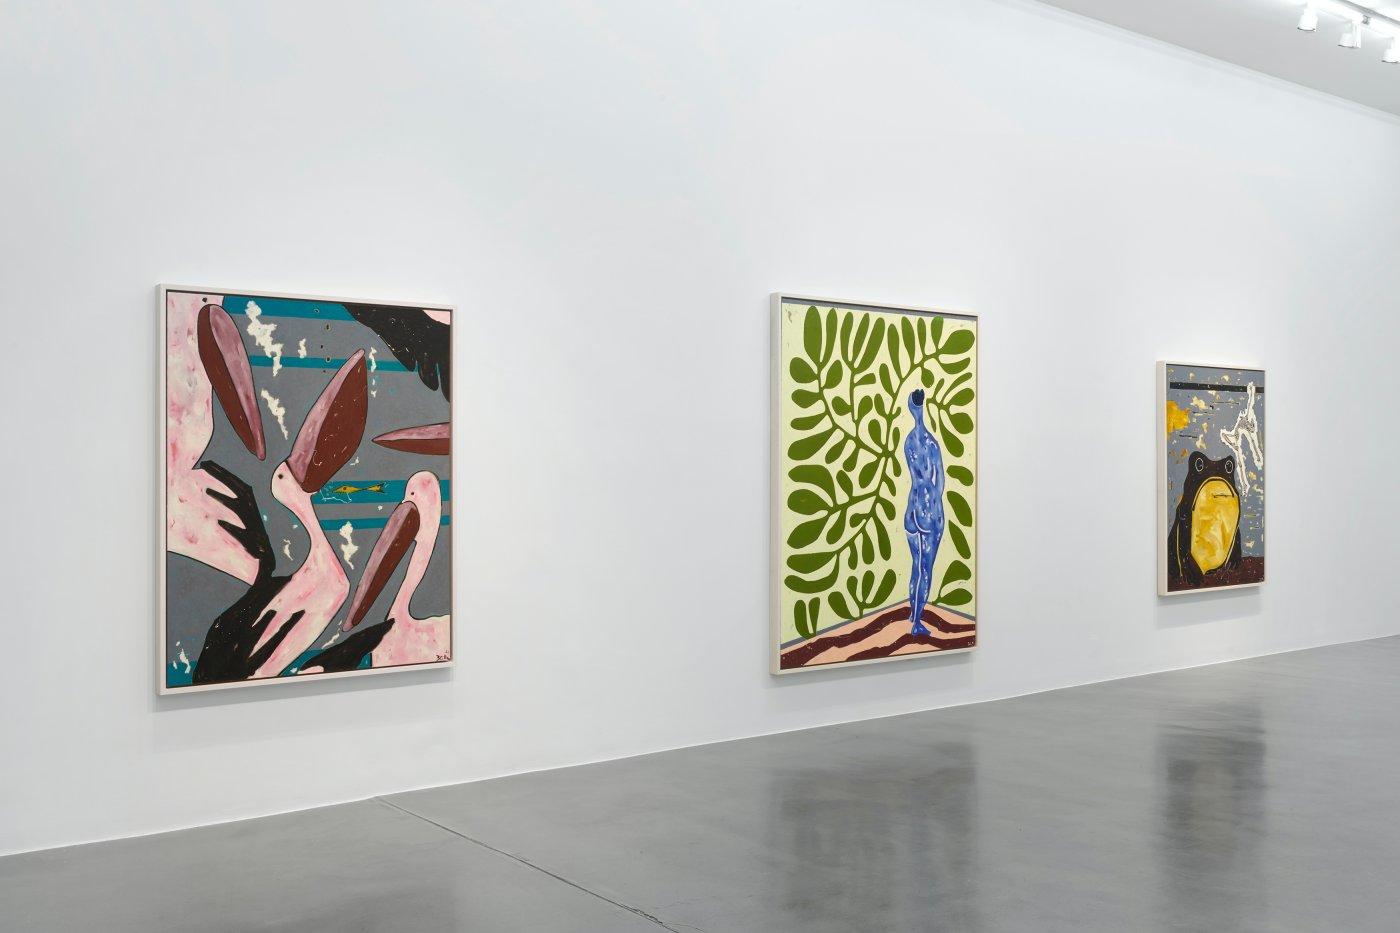 Simon Lee Gallery Werner Buttner 4